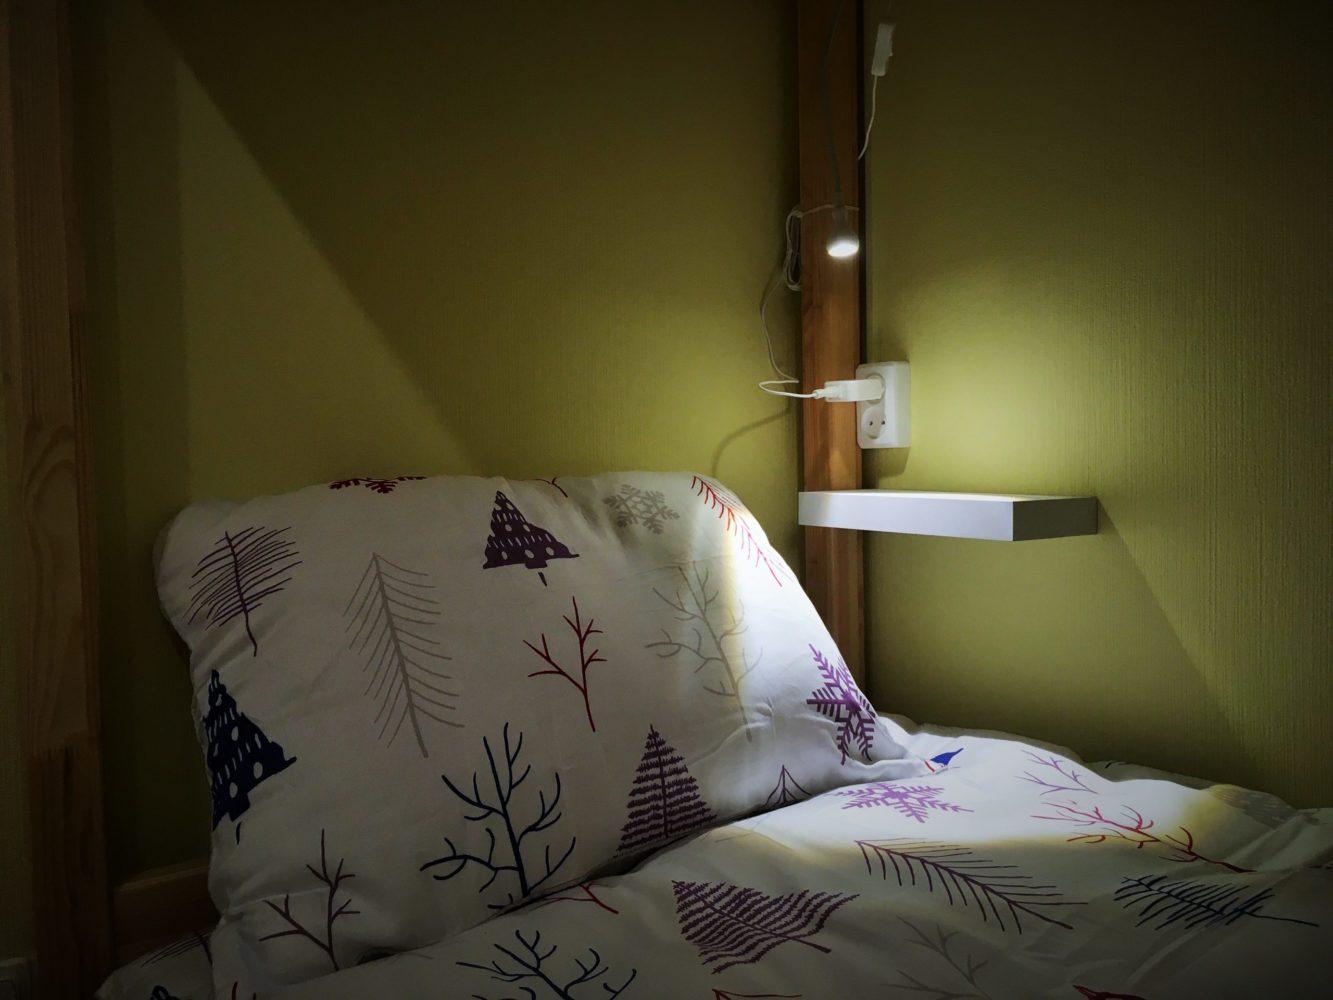 HOSTELJELGAVA.LV-YELLOW STONES-Central hostel jelgava-Hostelis Jelgava-naktsmītne Jelgavā.